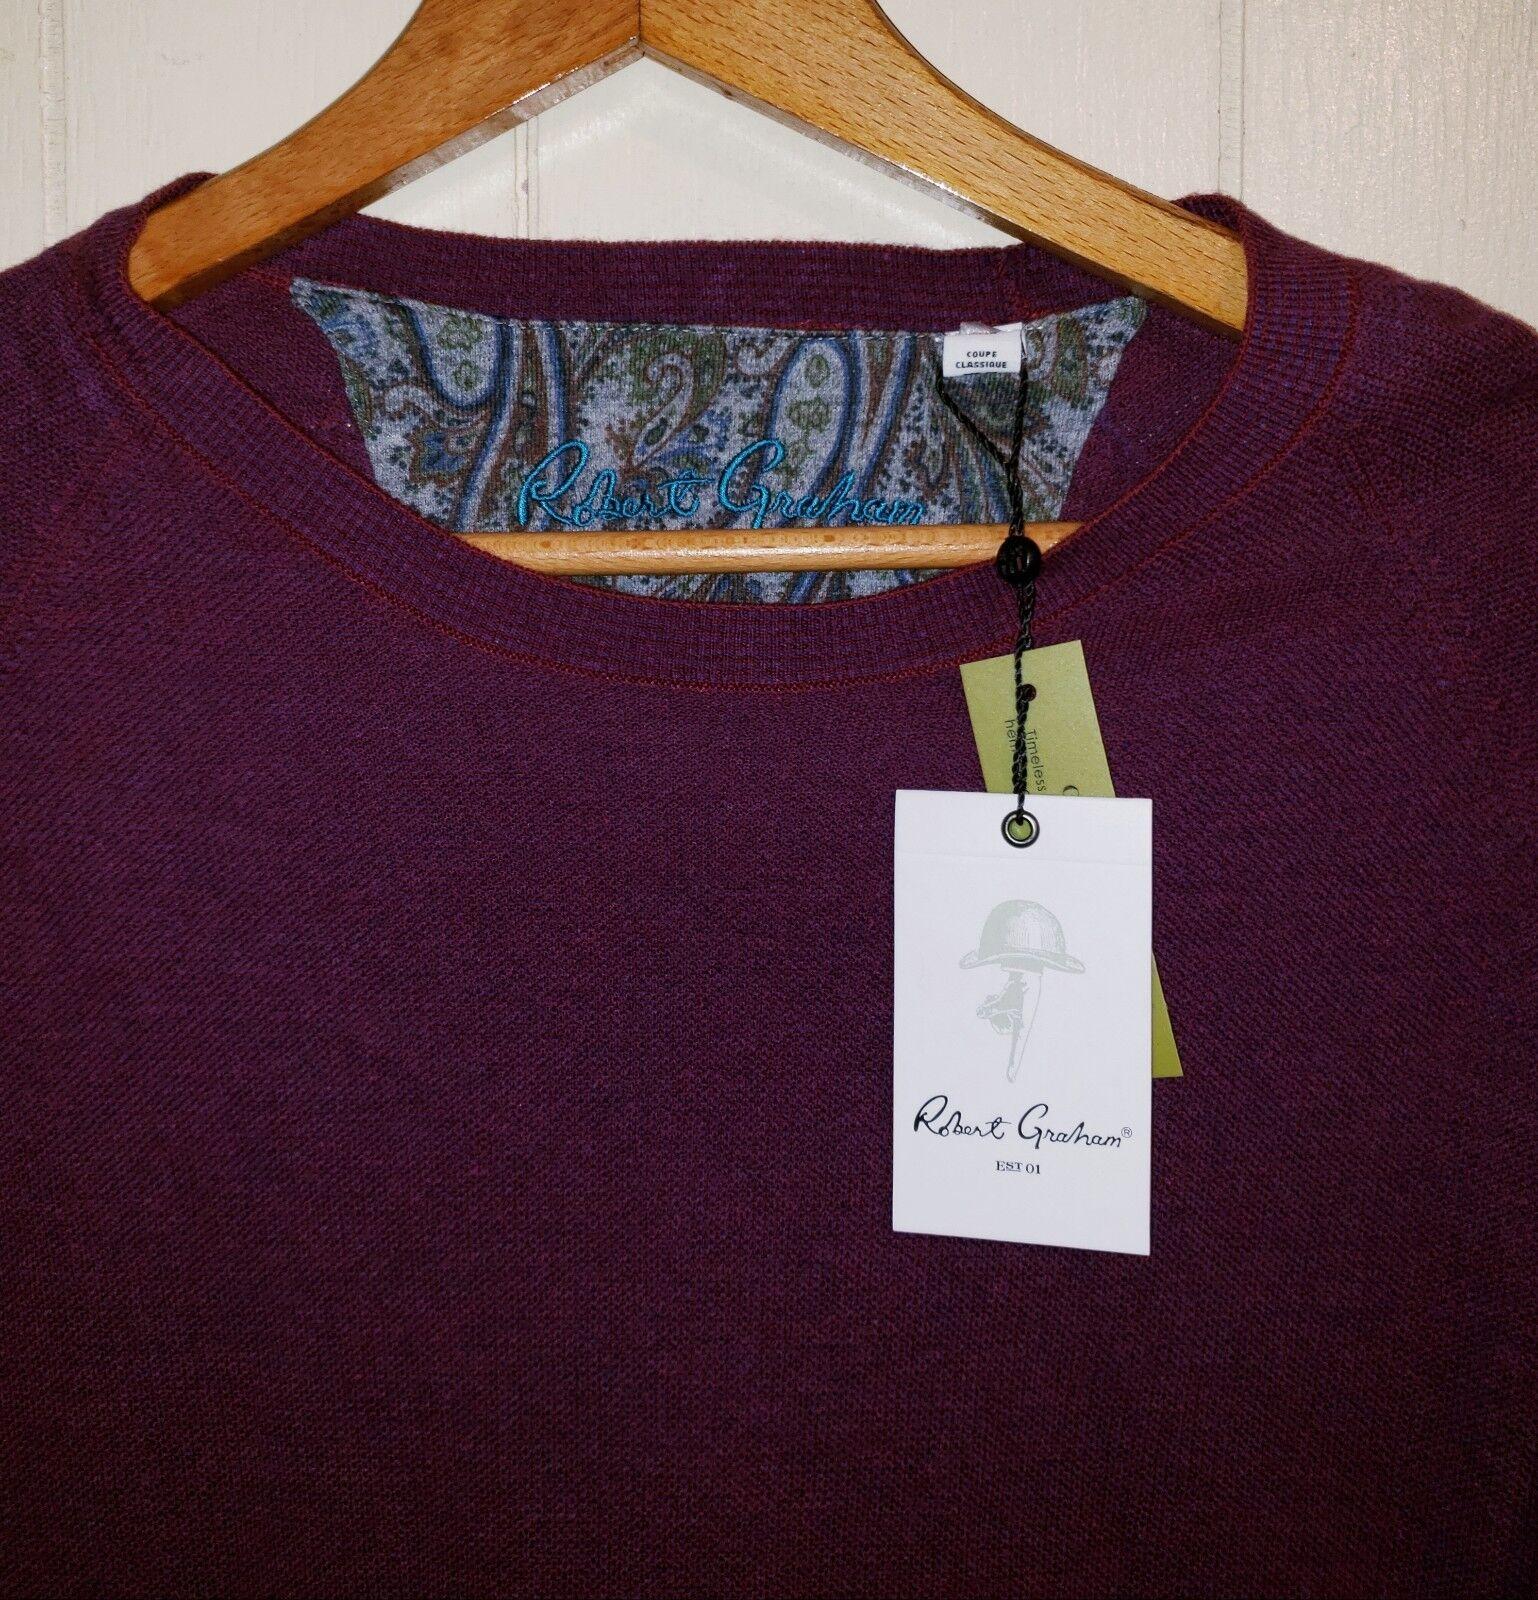 Robert Graham Wool Luxury Blend Sweater Shirt Mens 2XL NWT  Wine